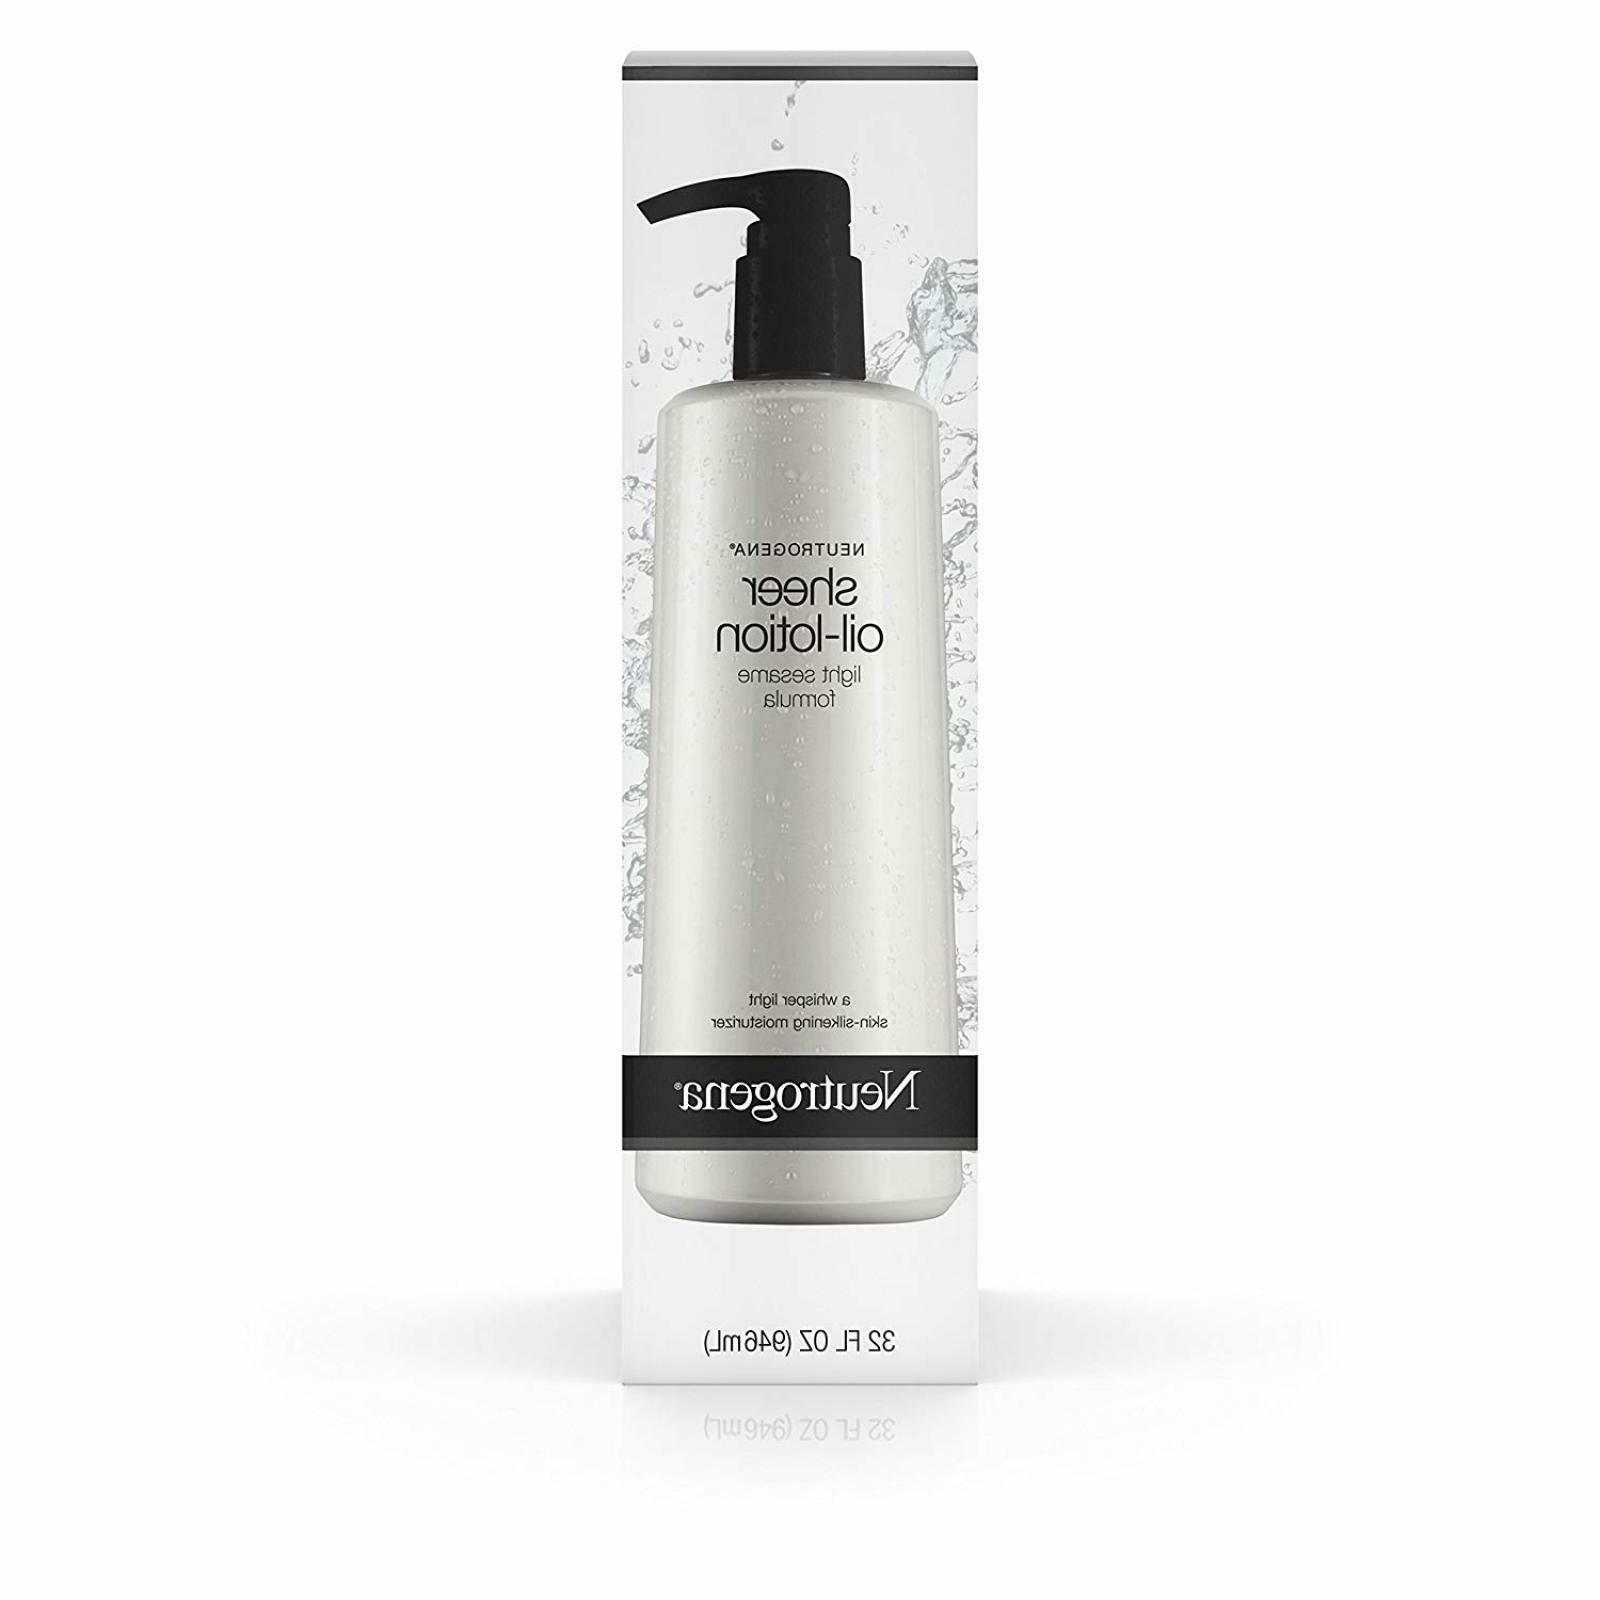 moisturizing sheer body oil lotion lightweight fast